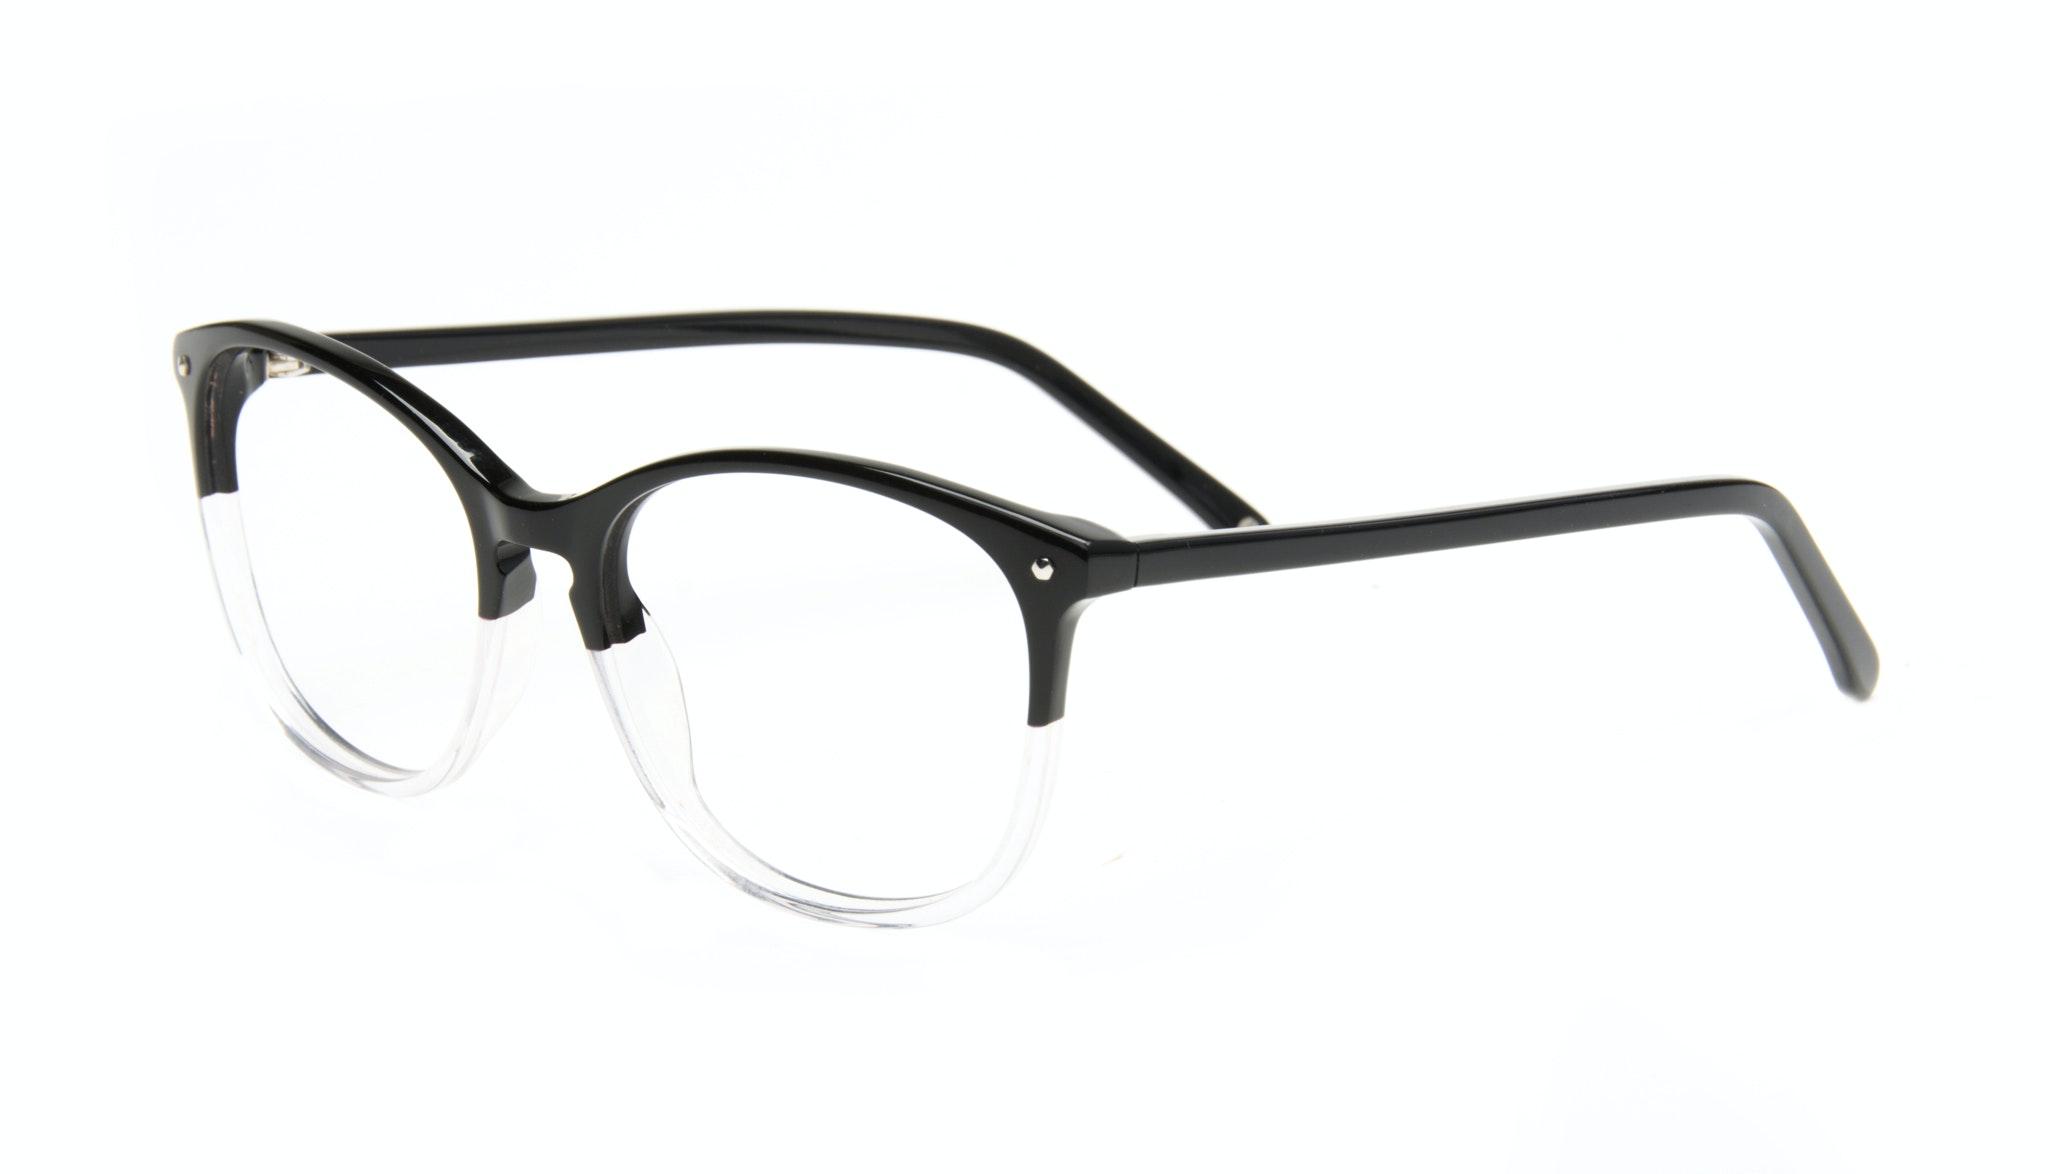 Affordable Fashion Glasses Rectangle Round Eyeglasses Women Nadine Two Tone Black Tilt